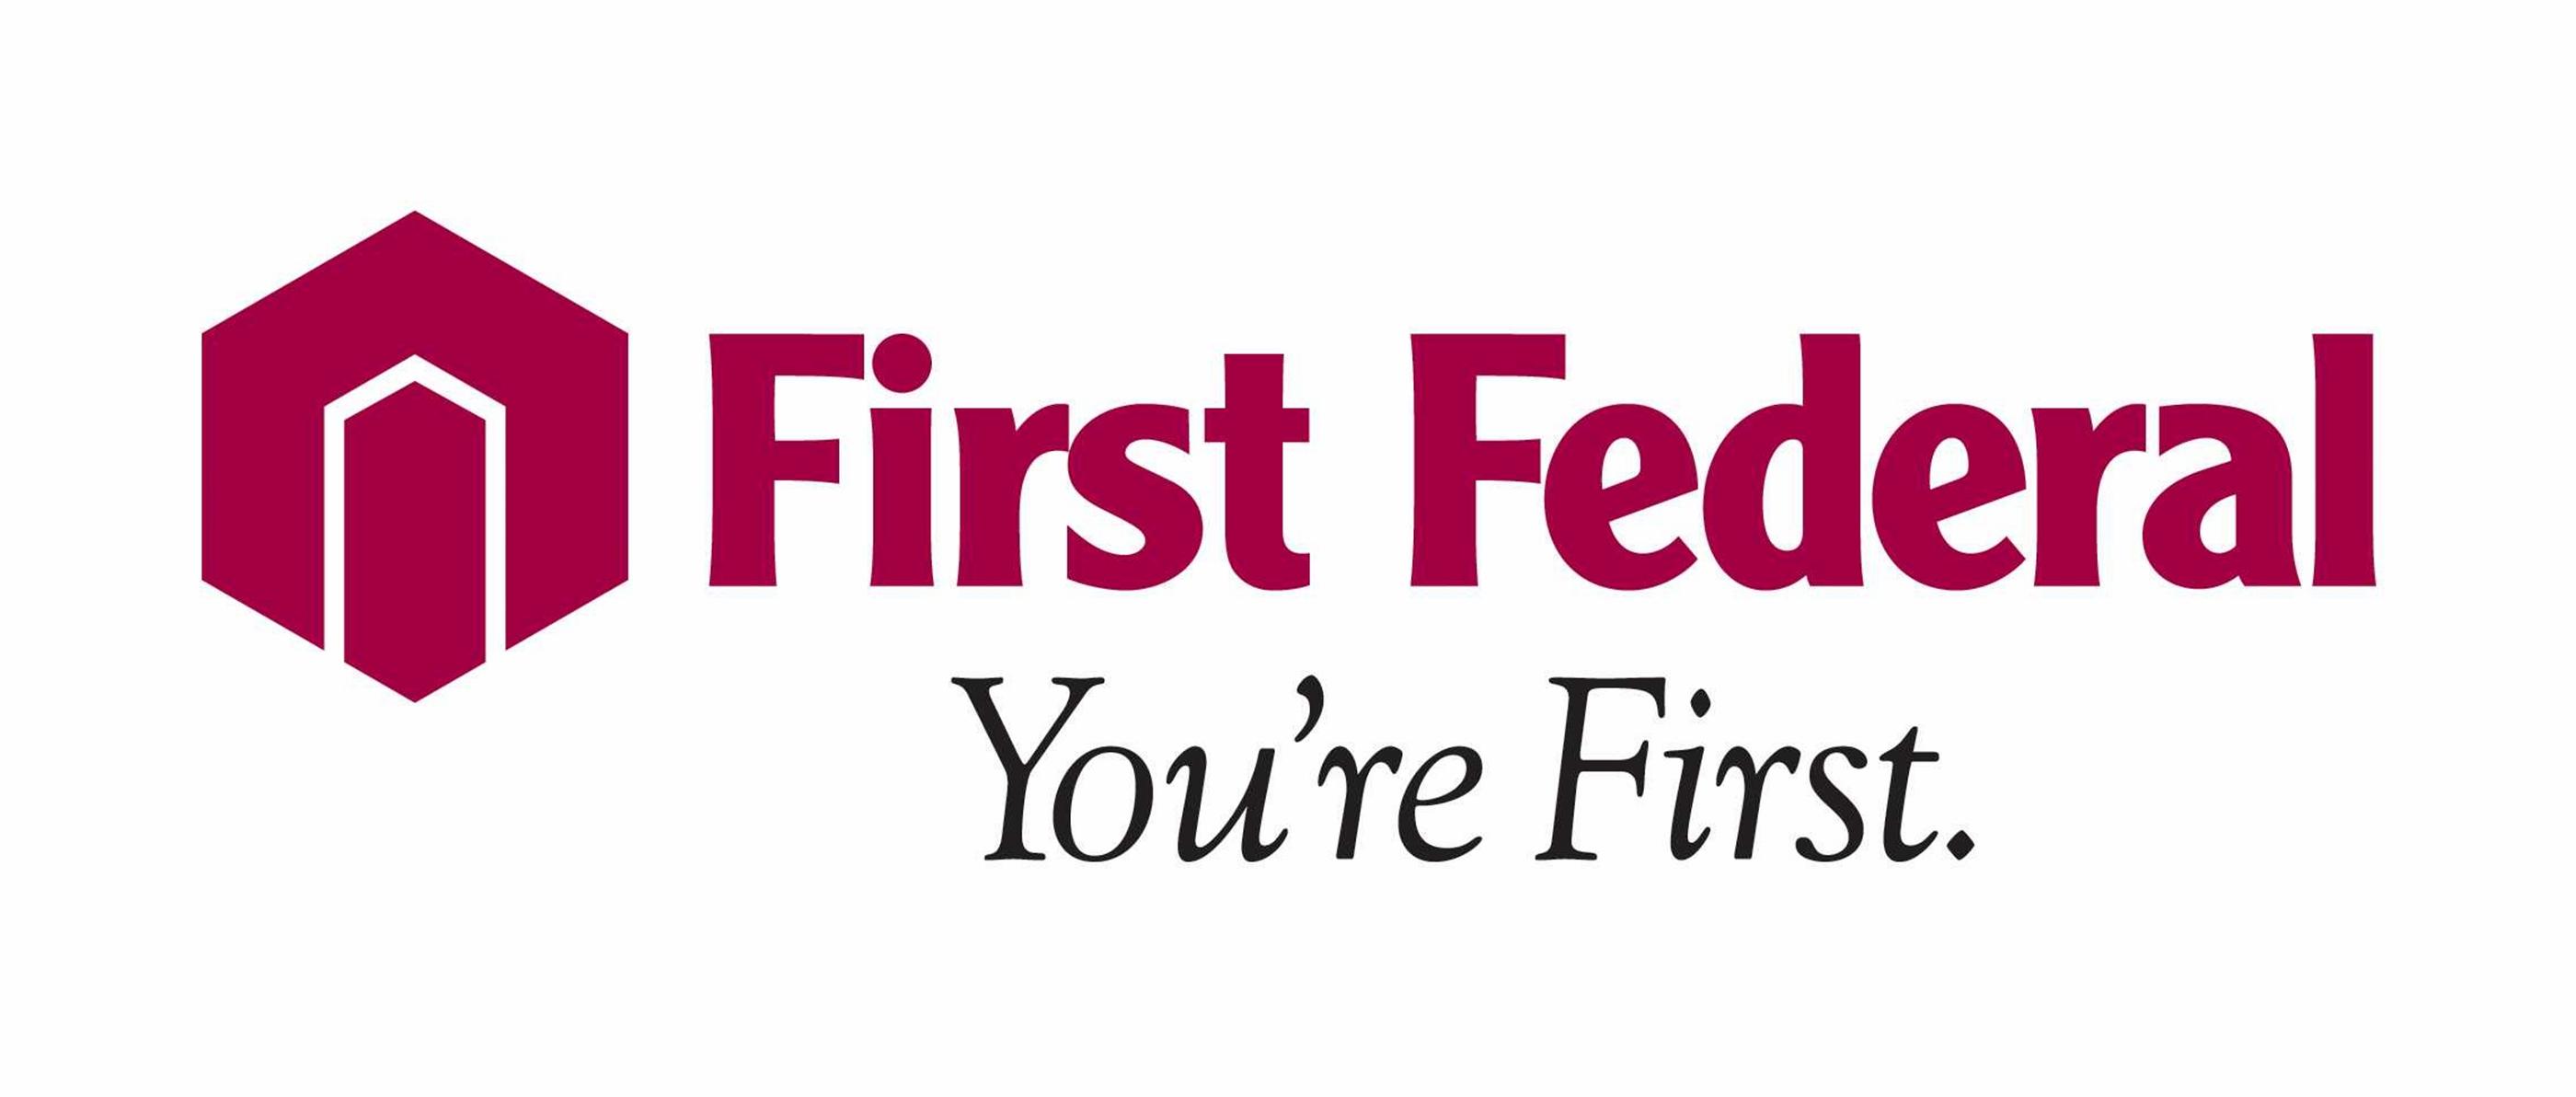 first federal credit card payment login address customer service. Black Bedroom Furniture Sets. Home Design Ideas